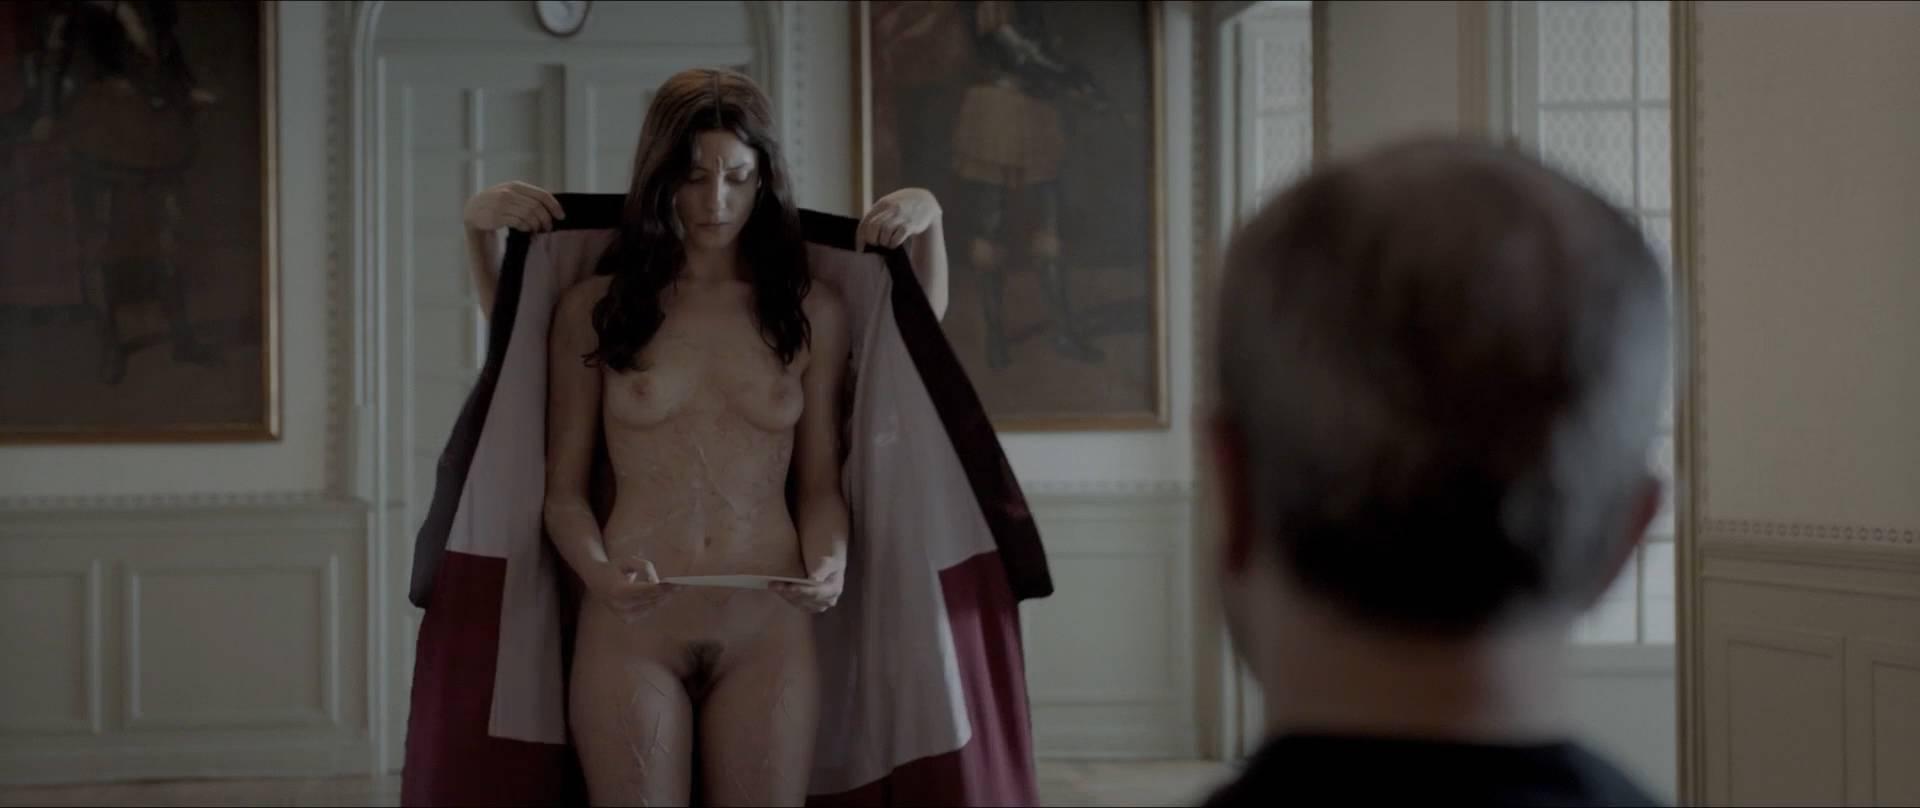 Bárbara Lennie nude full frontal - Magical Girl (ES-2014) hd080p (3)